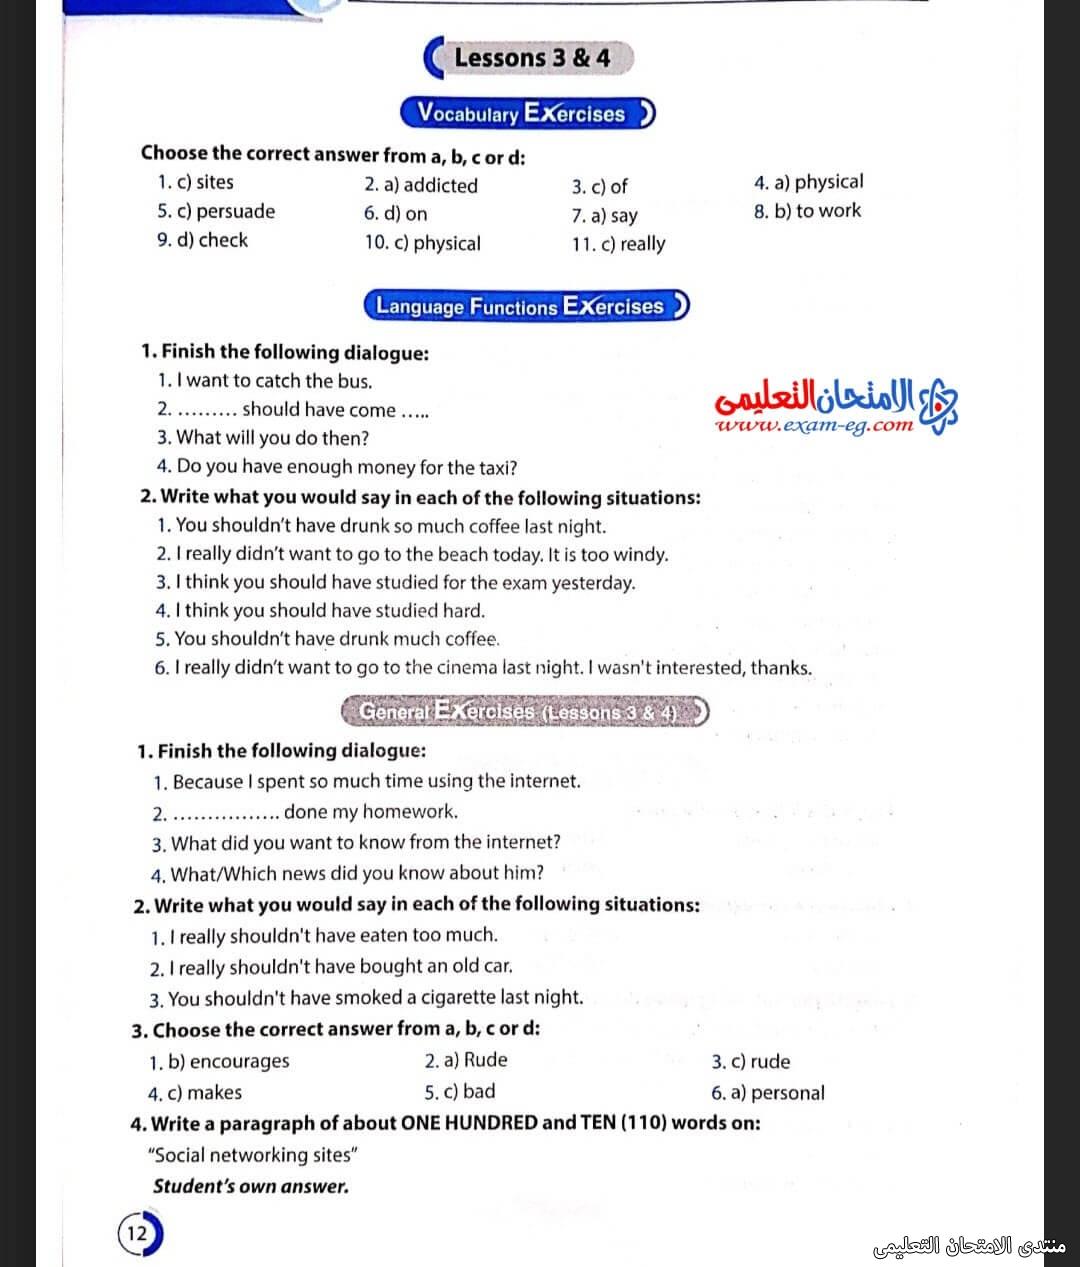 exam-eg.com_162236206001485.jpg